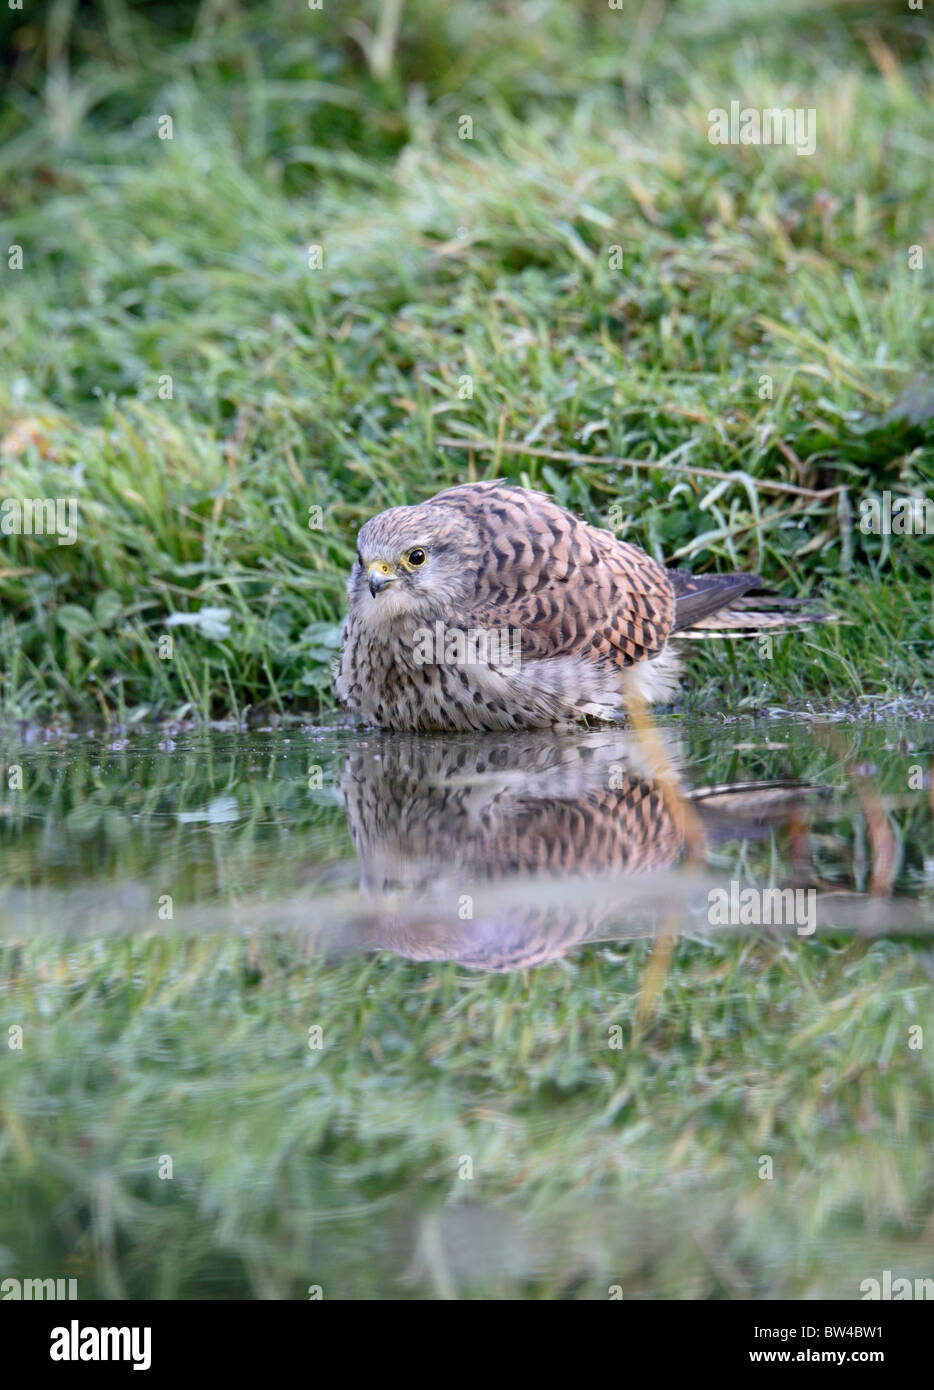 Kestrel ( Falco tinnunculus ) female bathing in pond - Stock Image